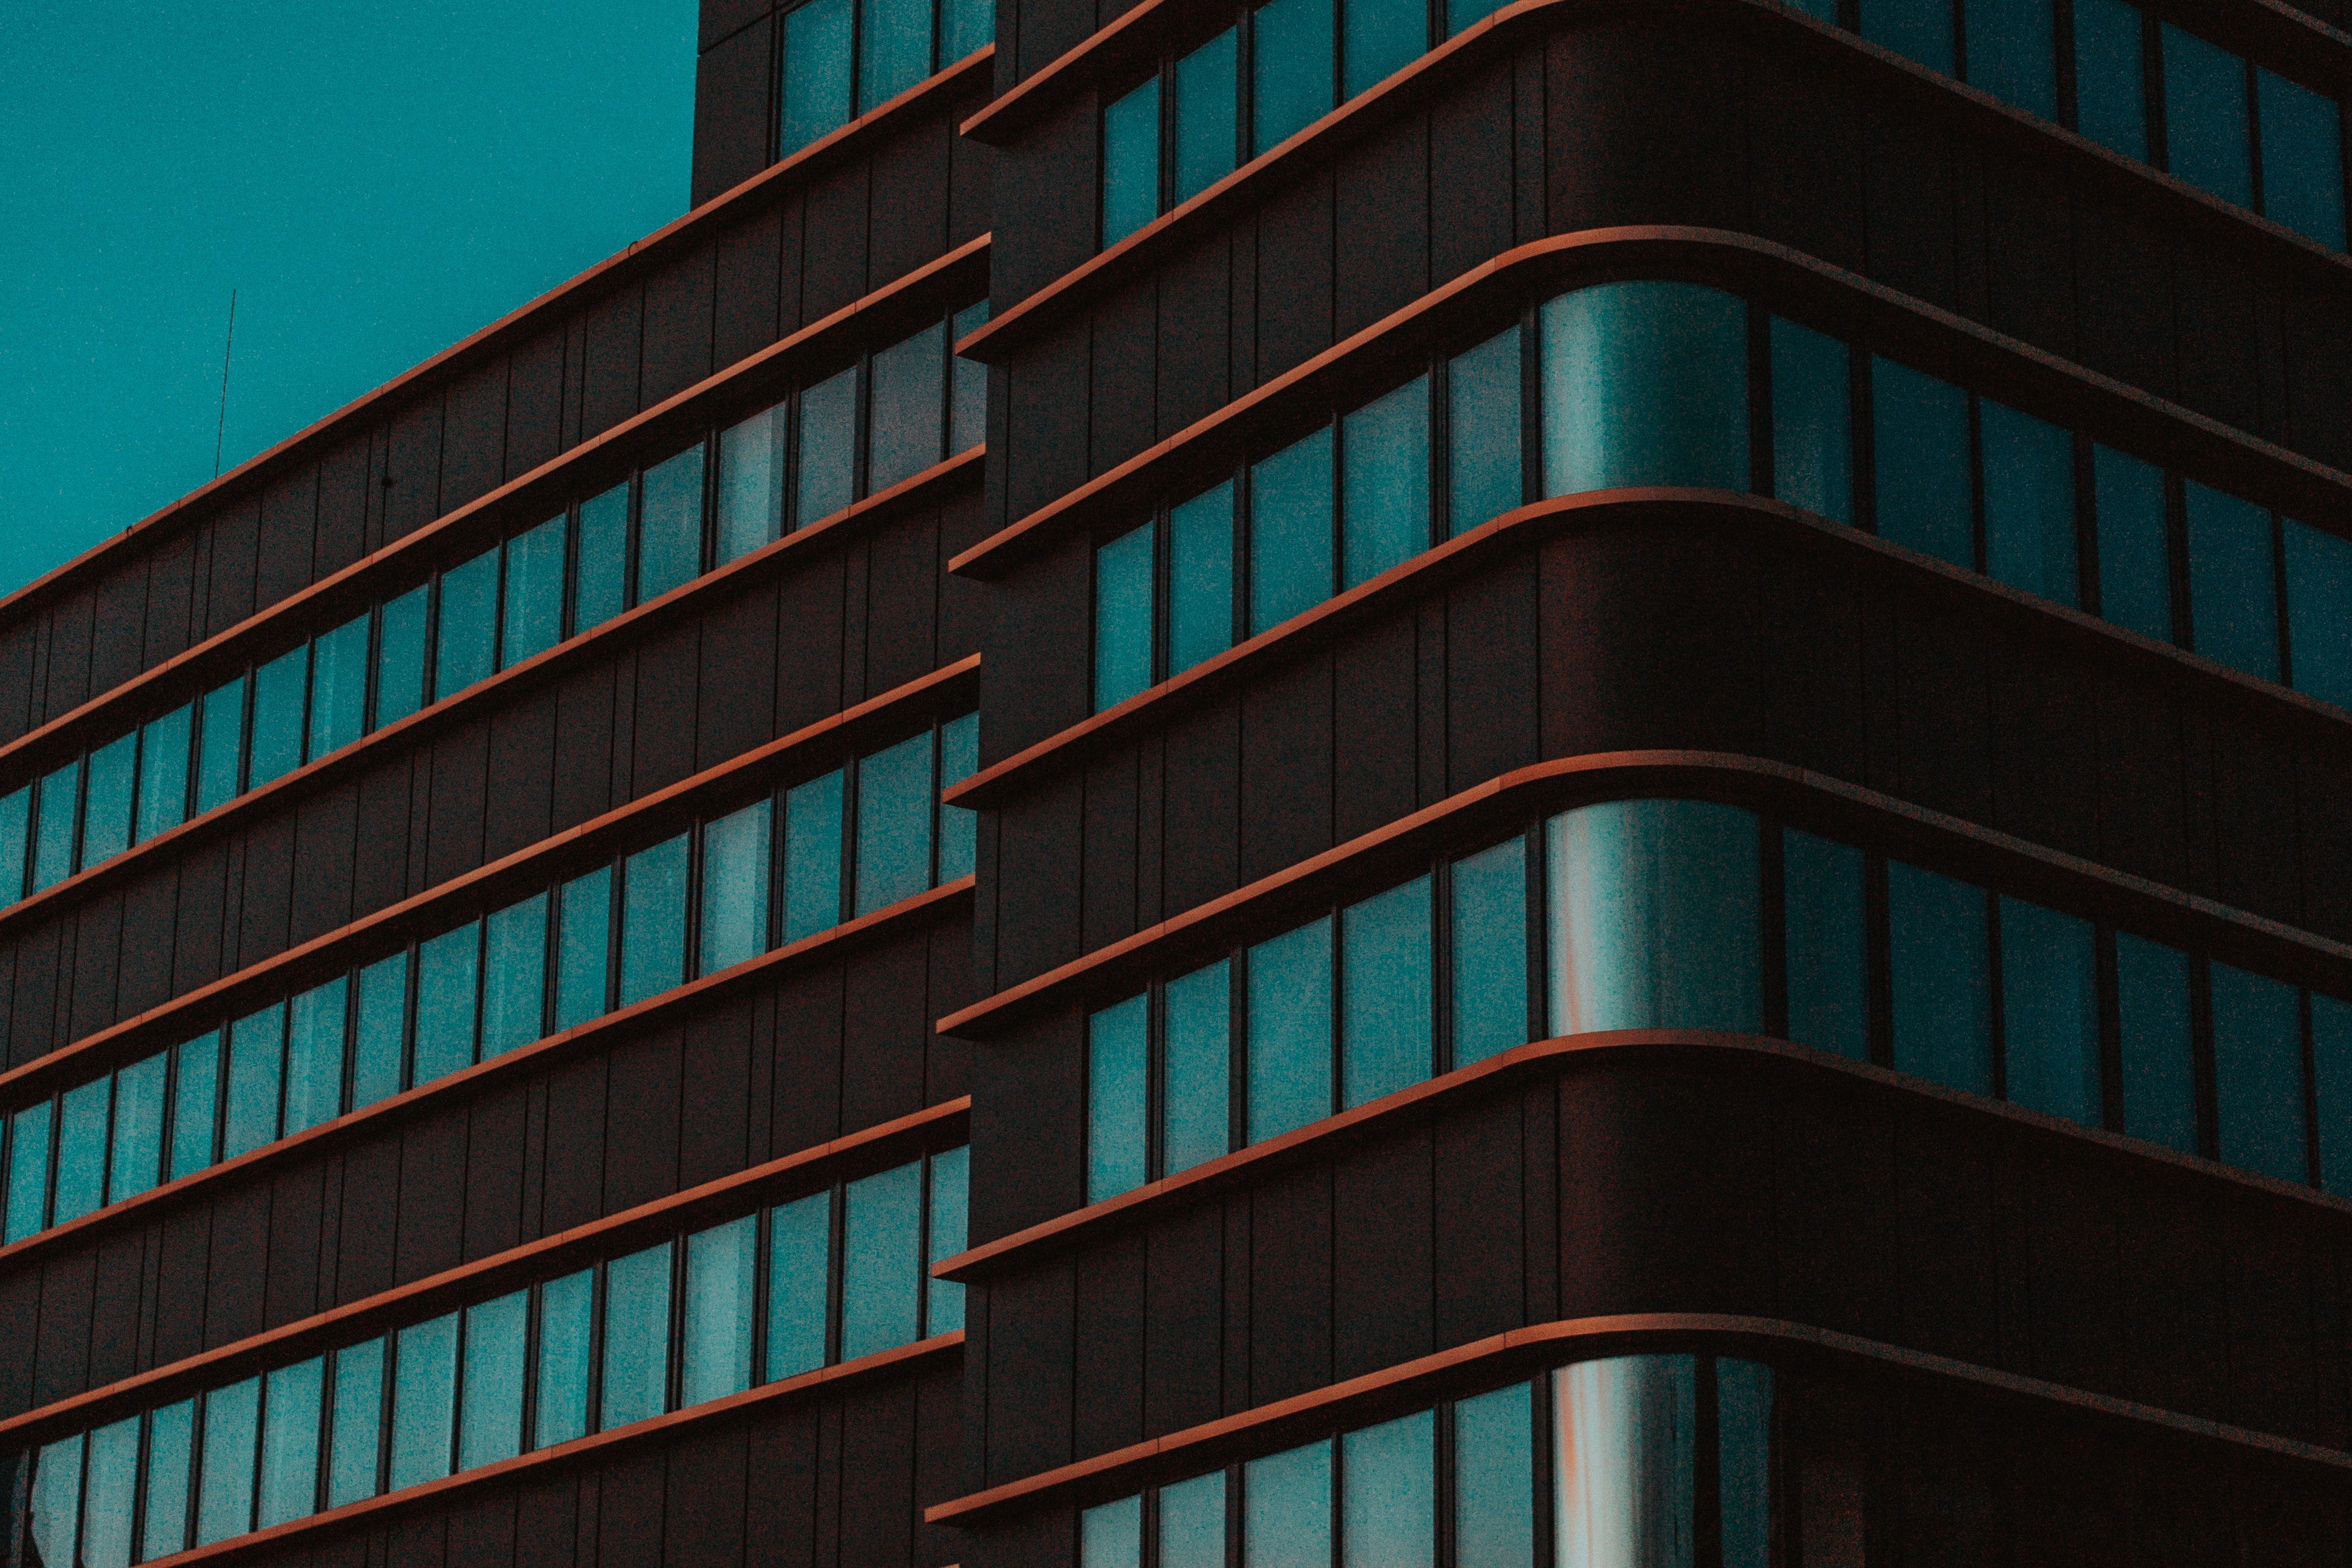 How Can Companies Like Horizon Prevent Destructive Breaches of Trust?